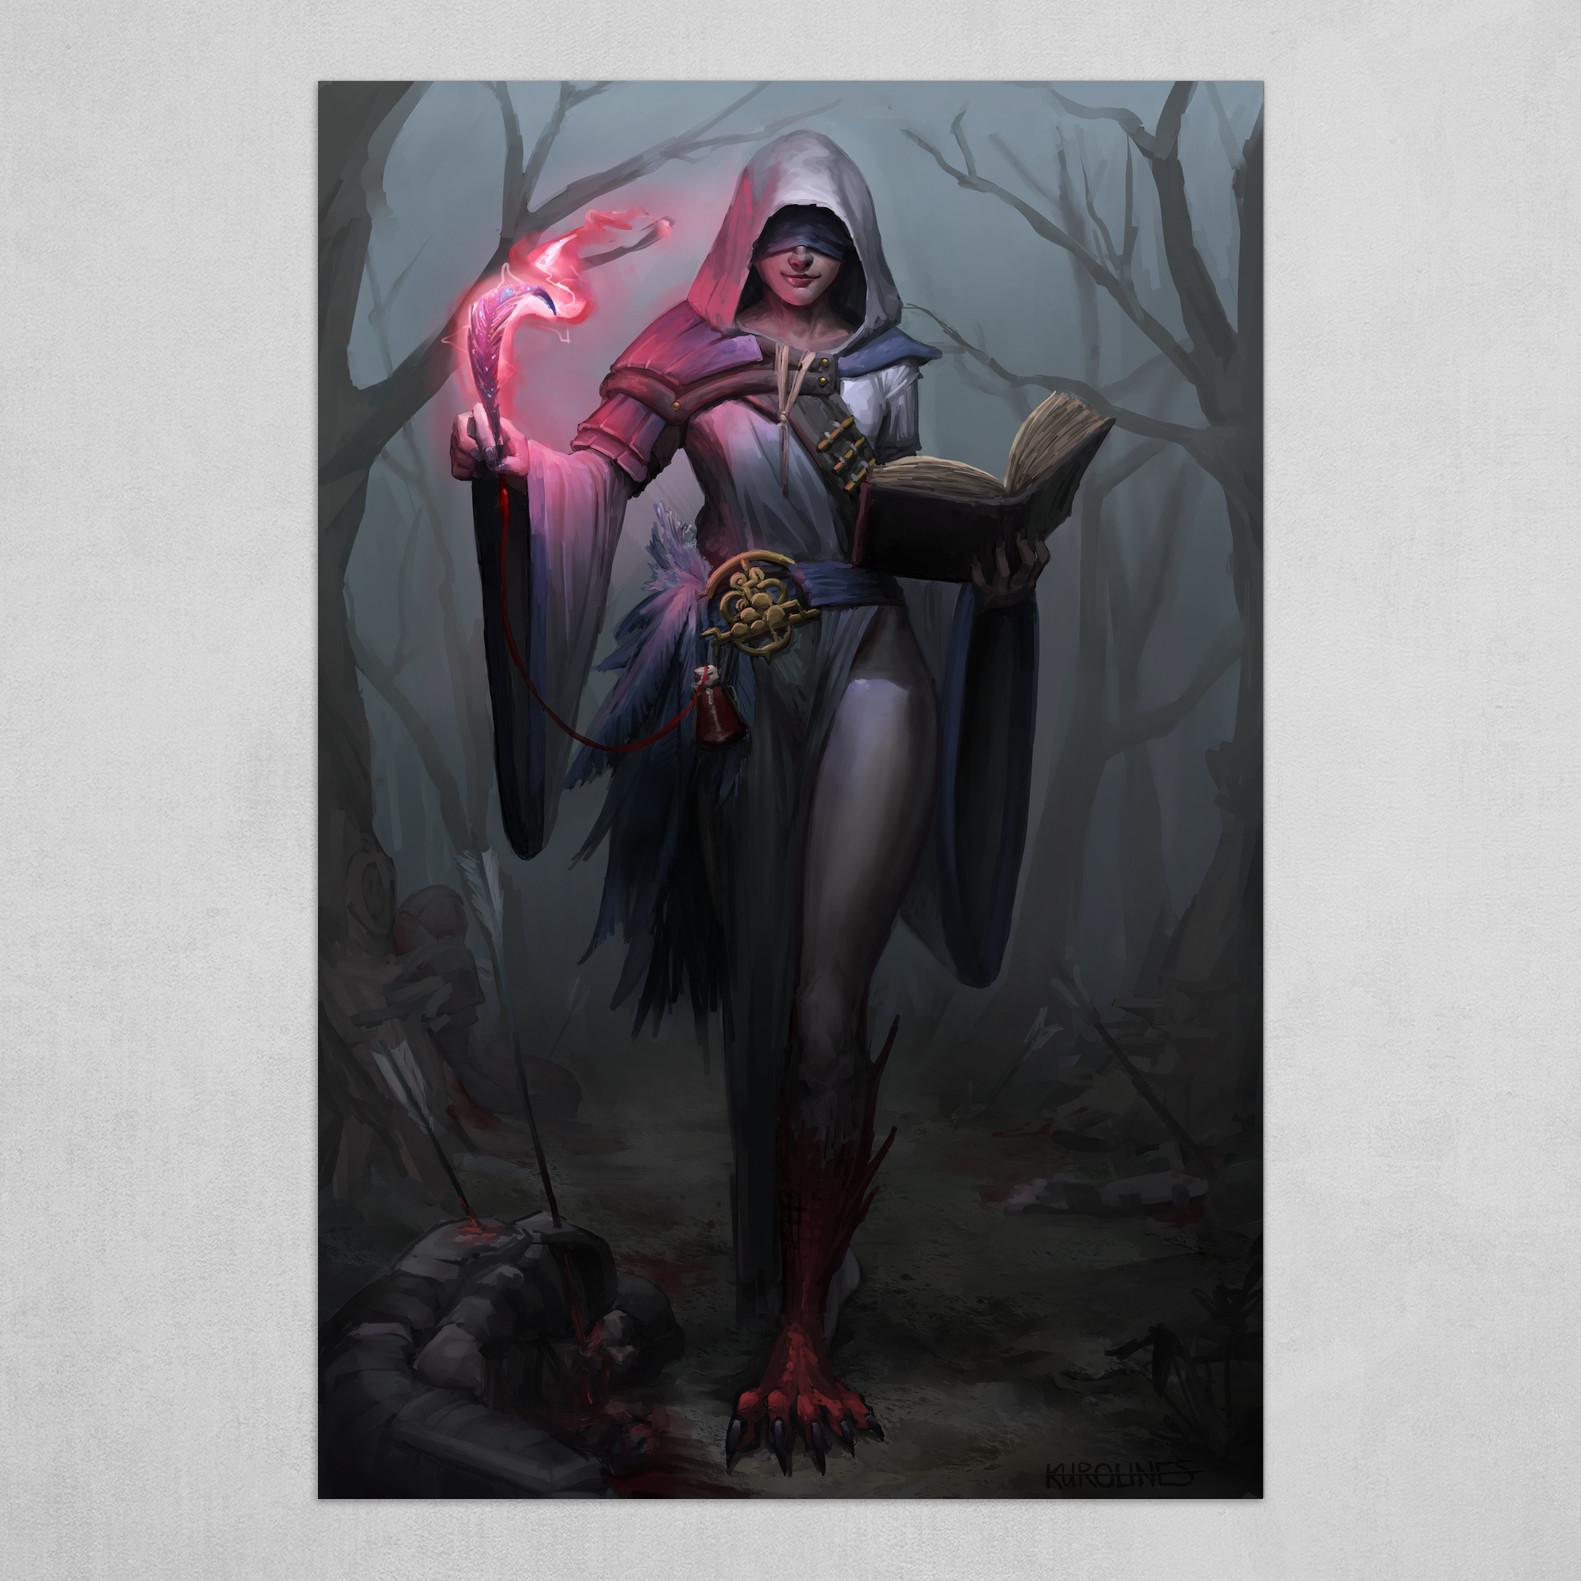 Demonic Priestess Fantasy Artwork